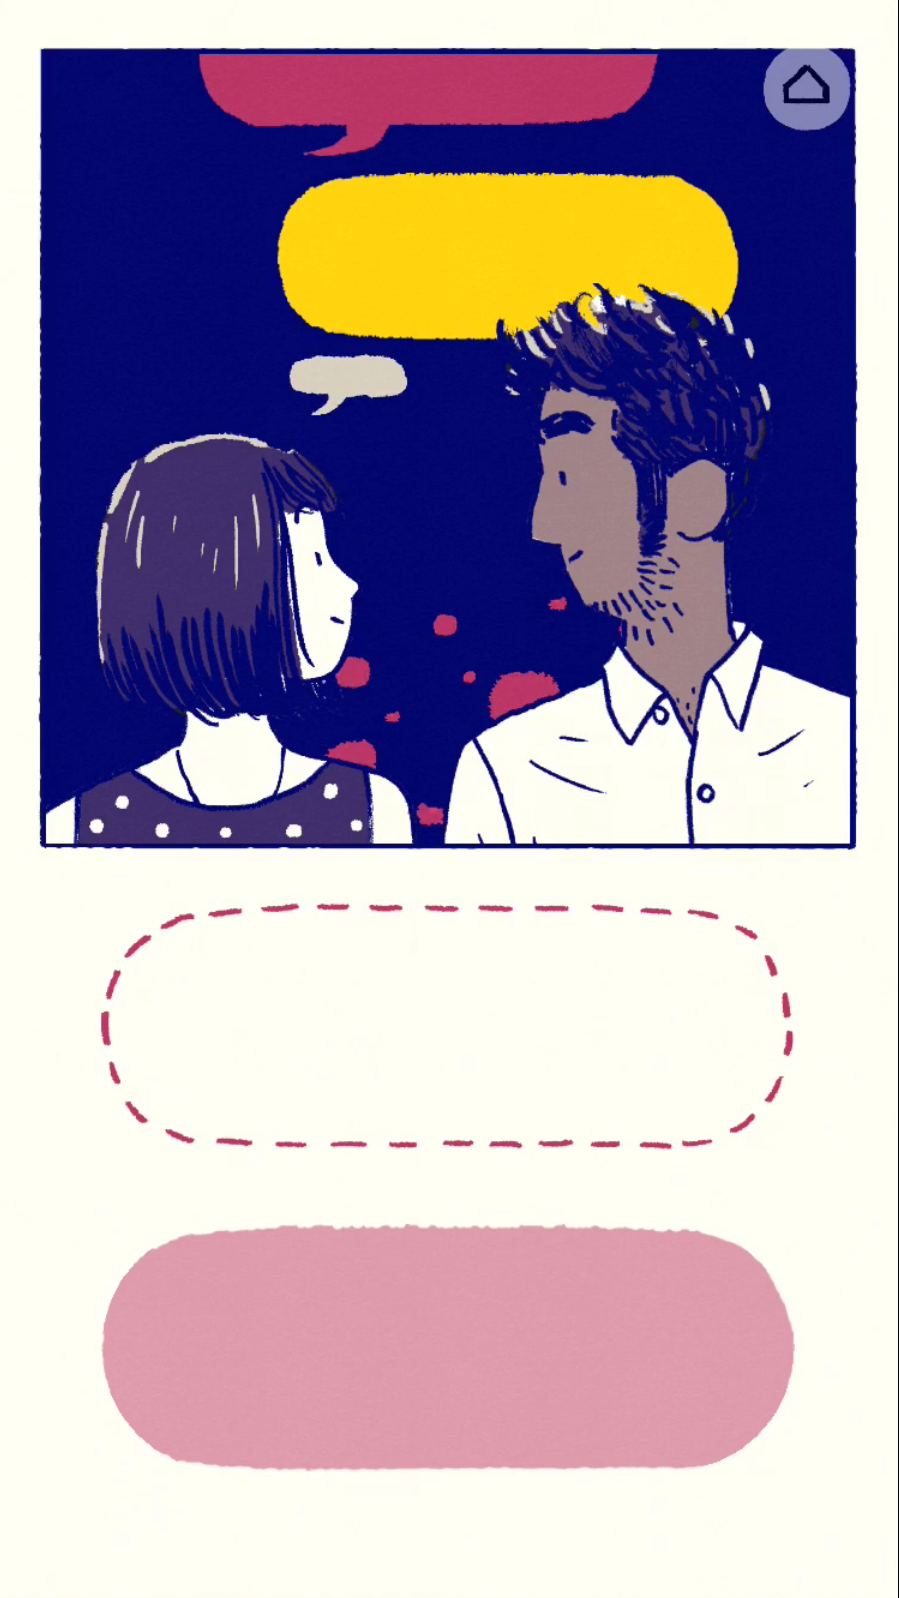 Florence - jigsaw, easy